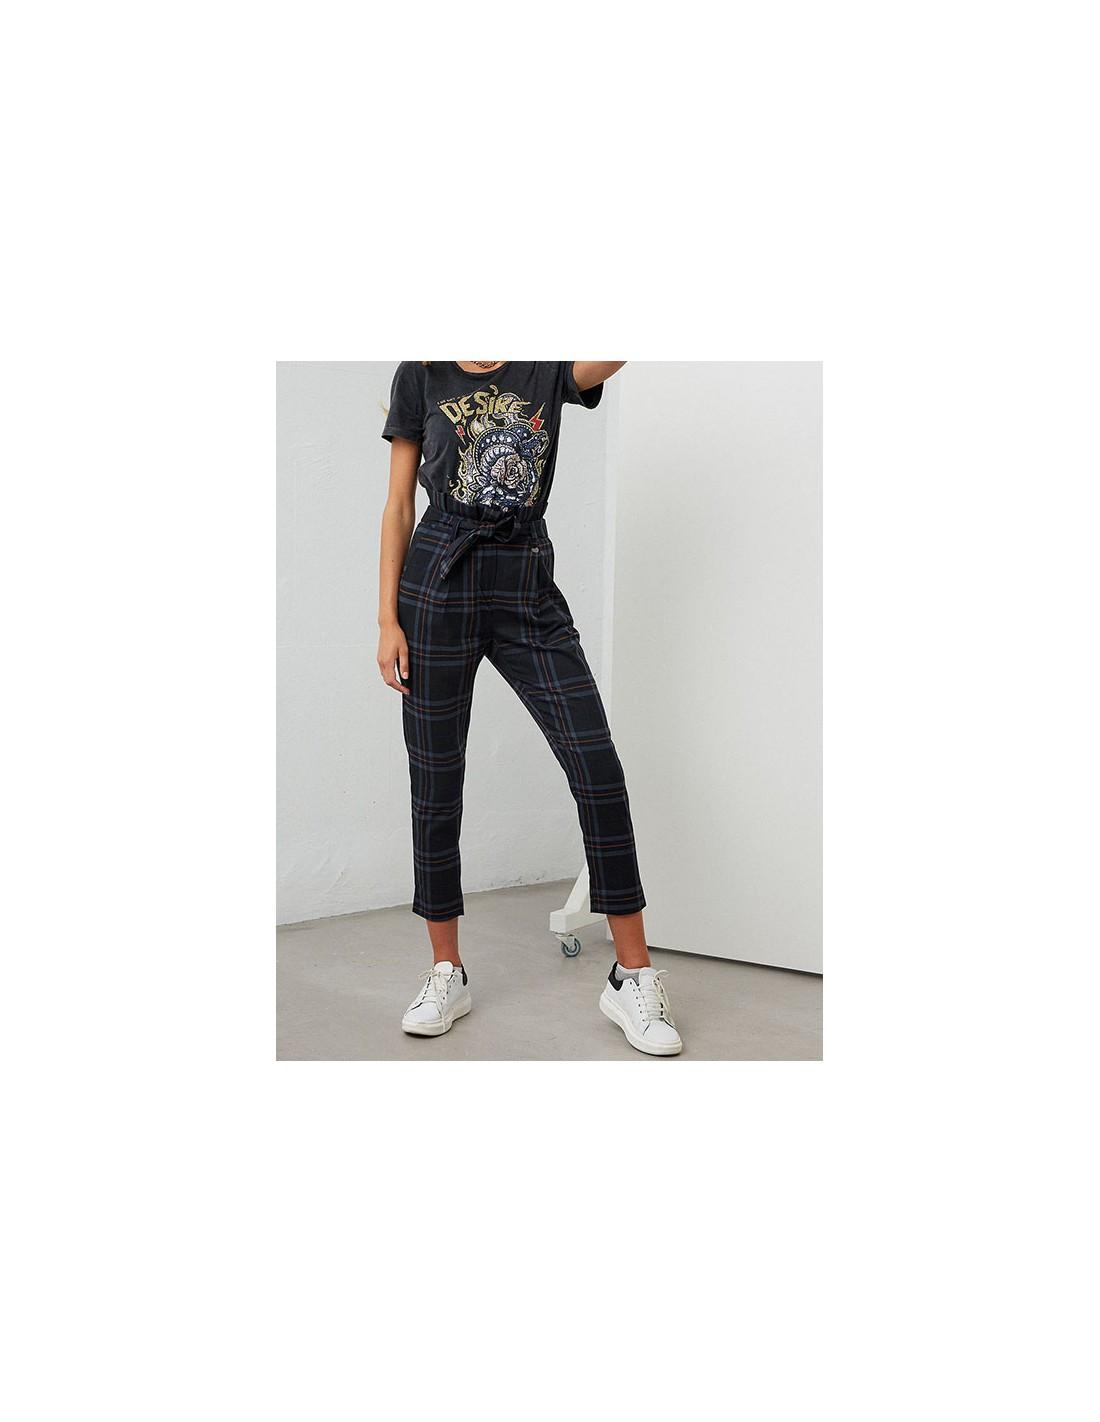 pantalones-bsb-044-212004